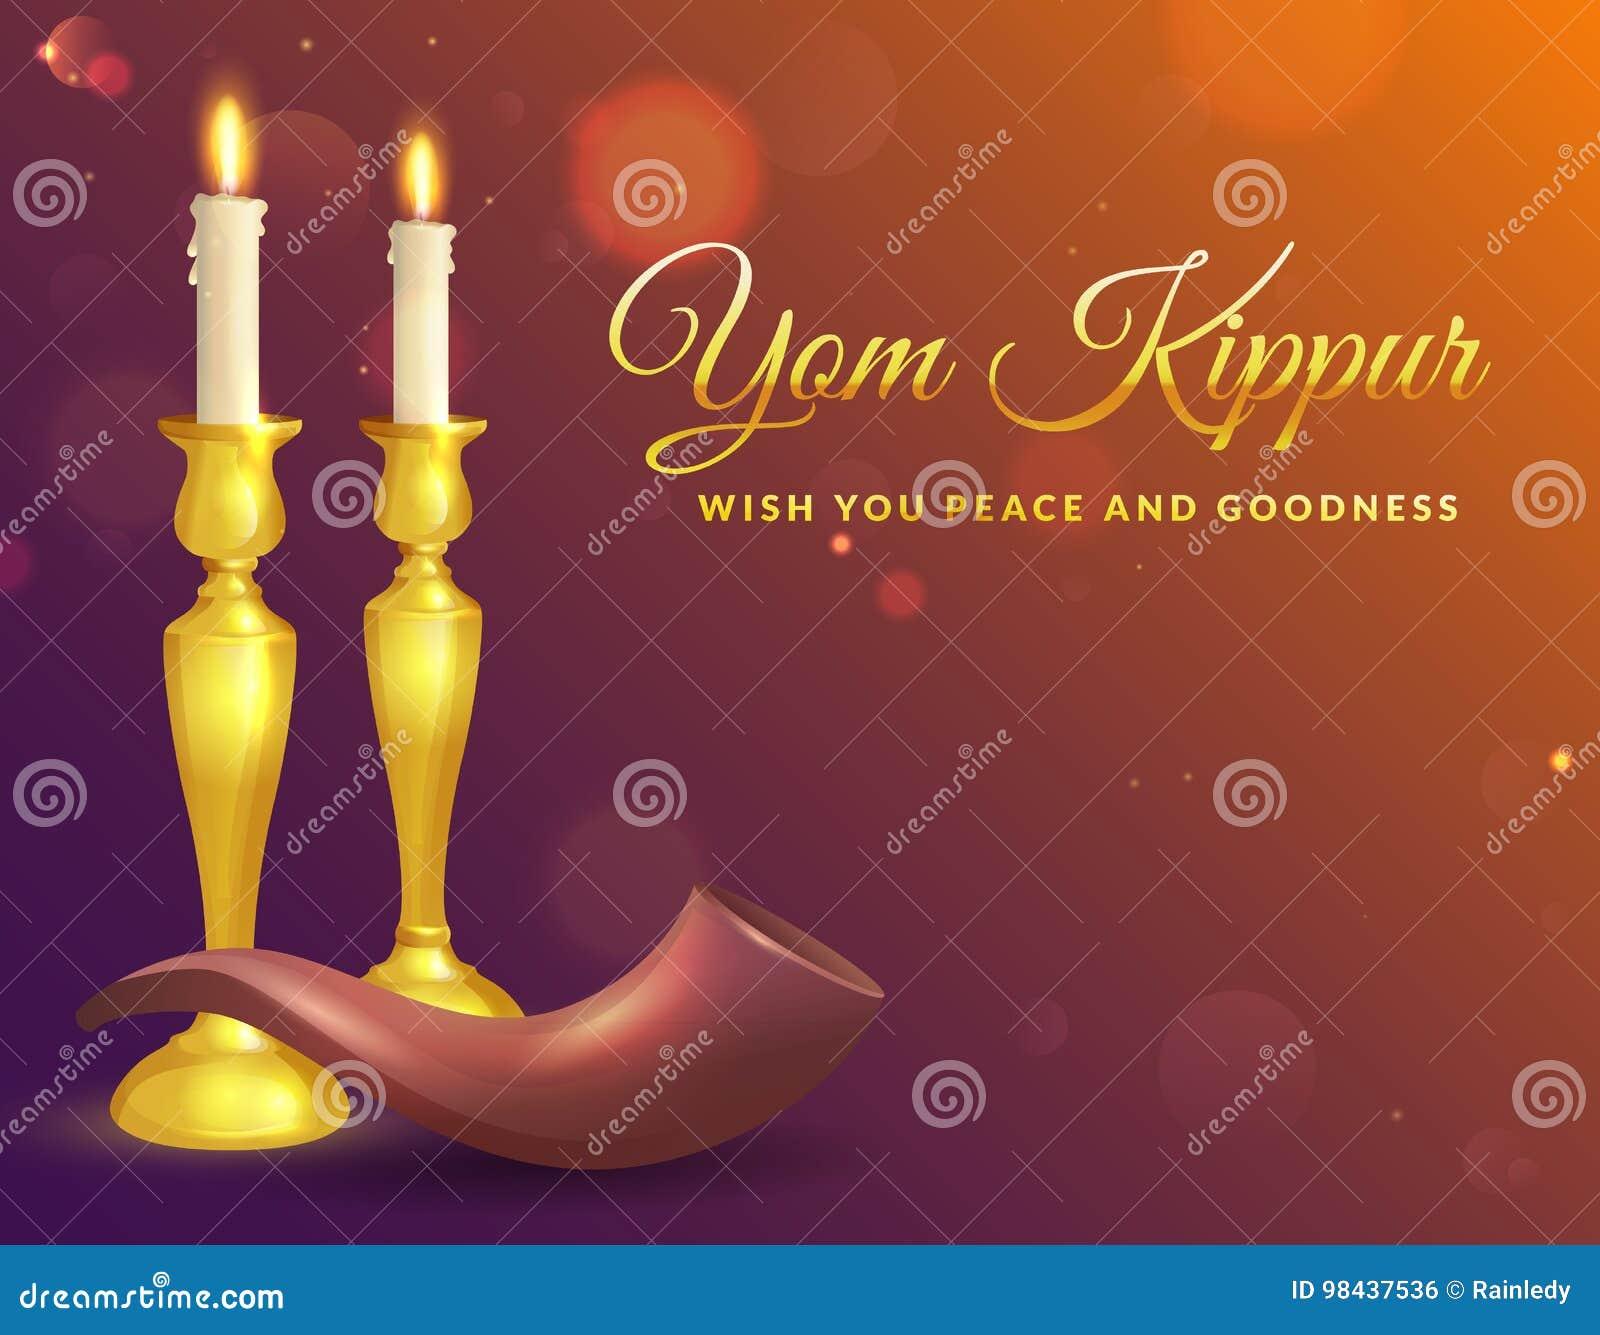 Yom Kippur Greeting Card Stock Vector Illustration Of Faith 98437536